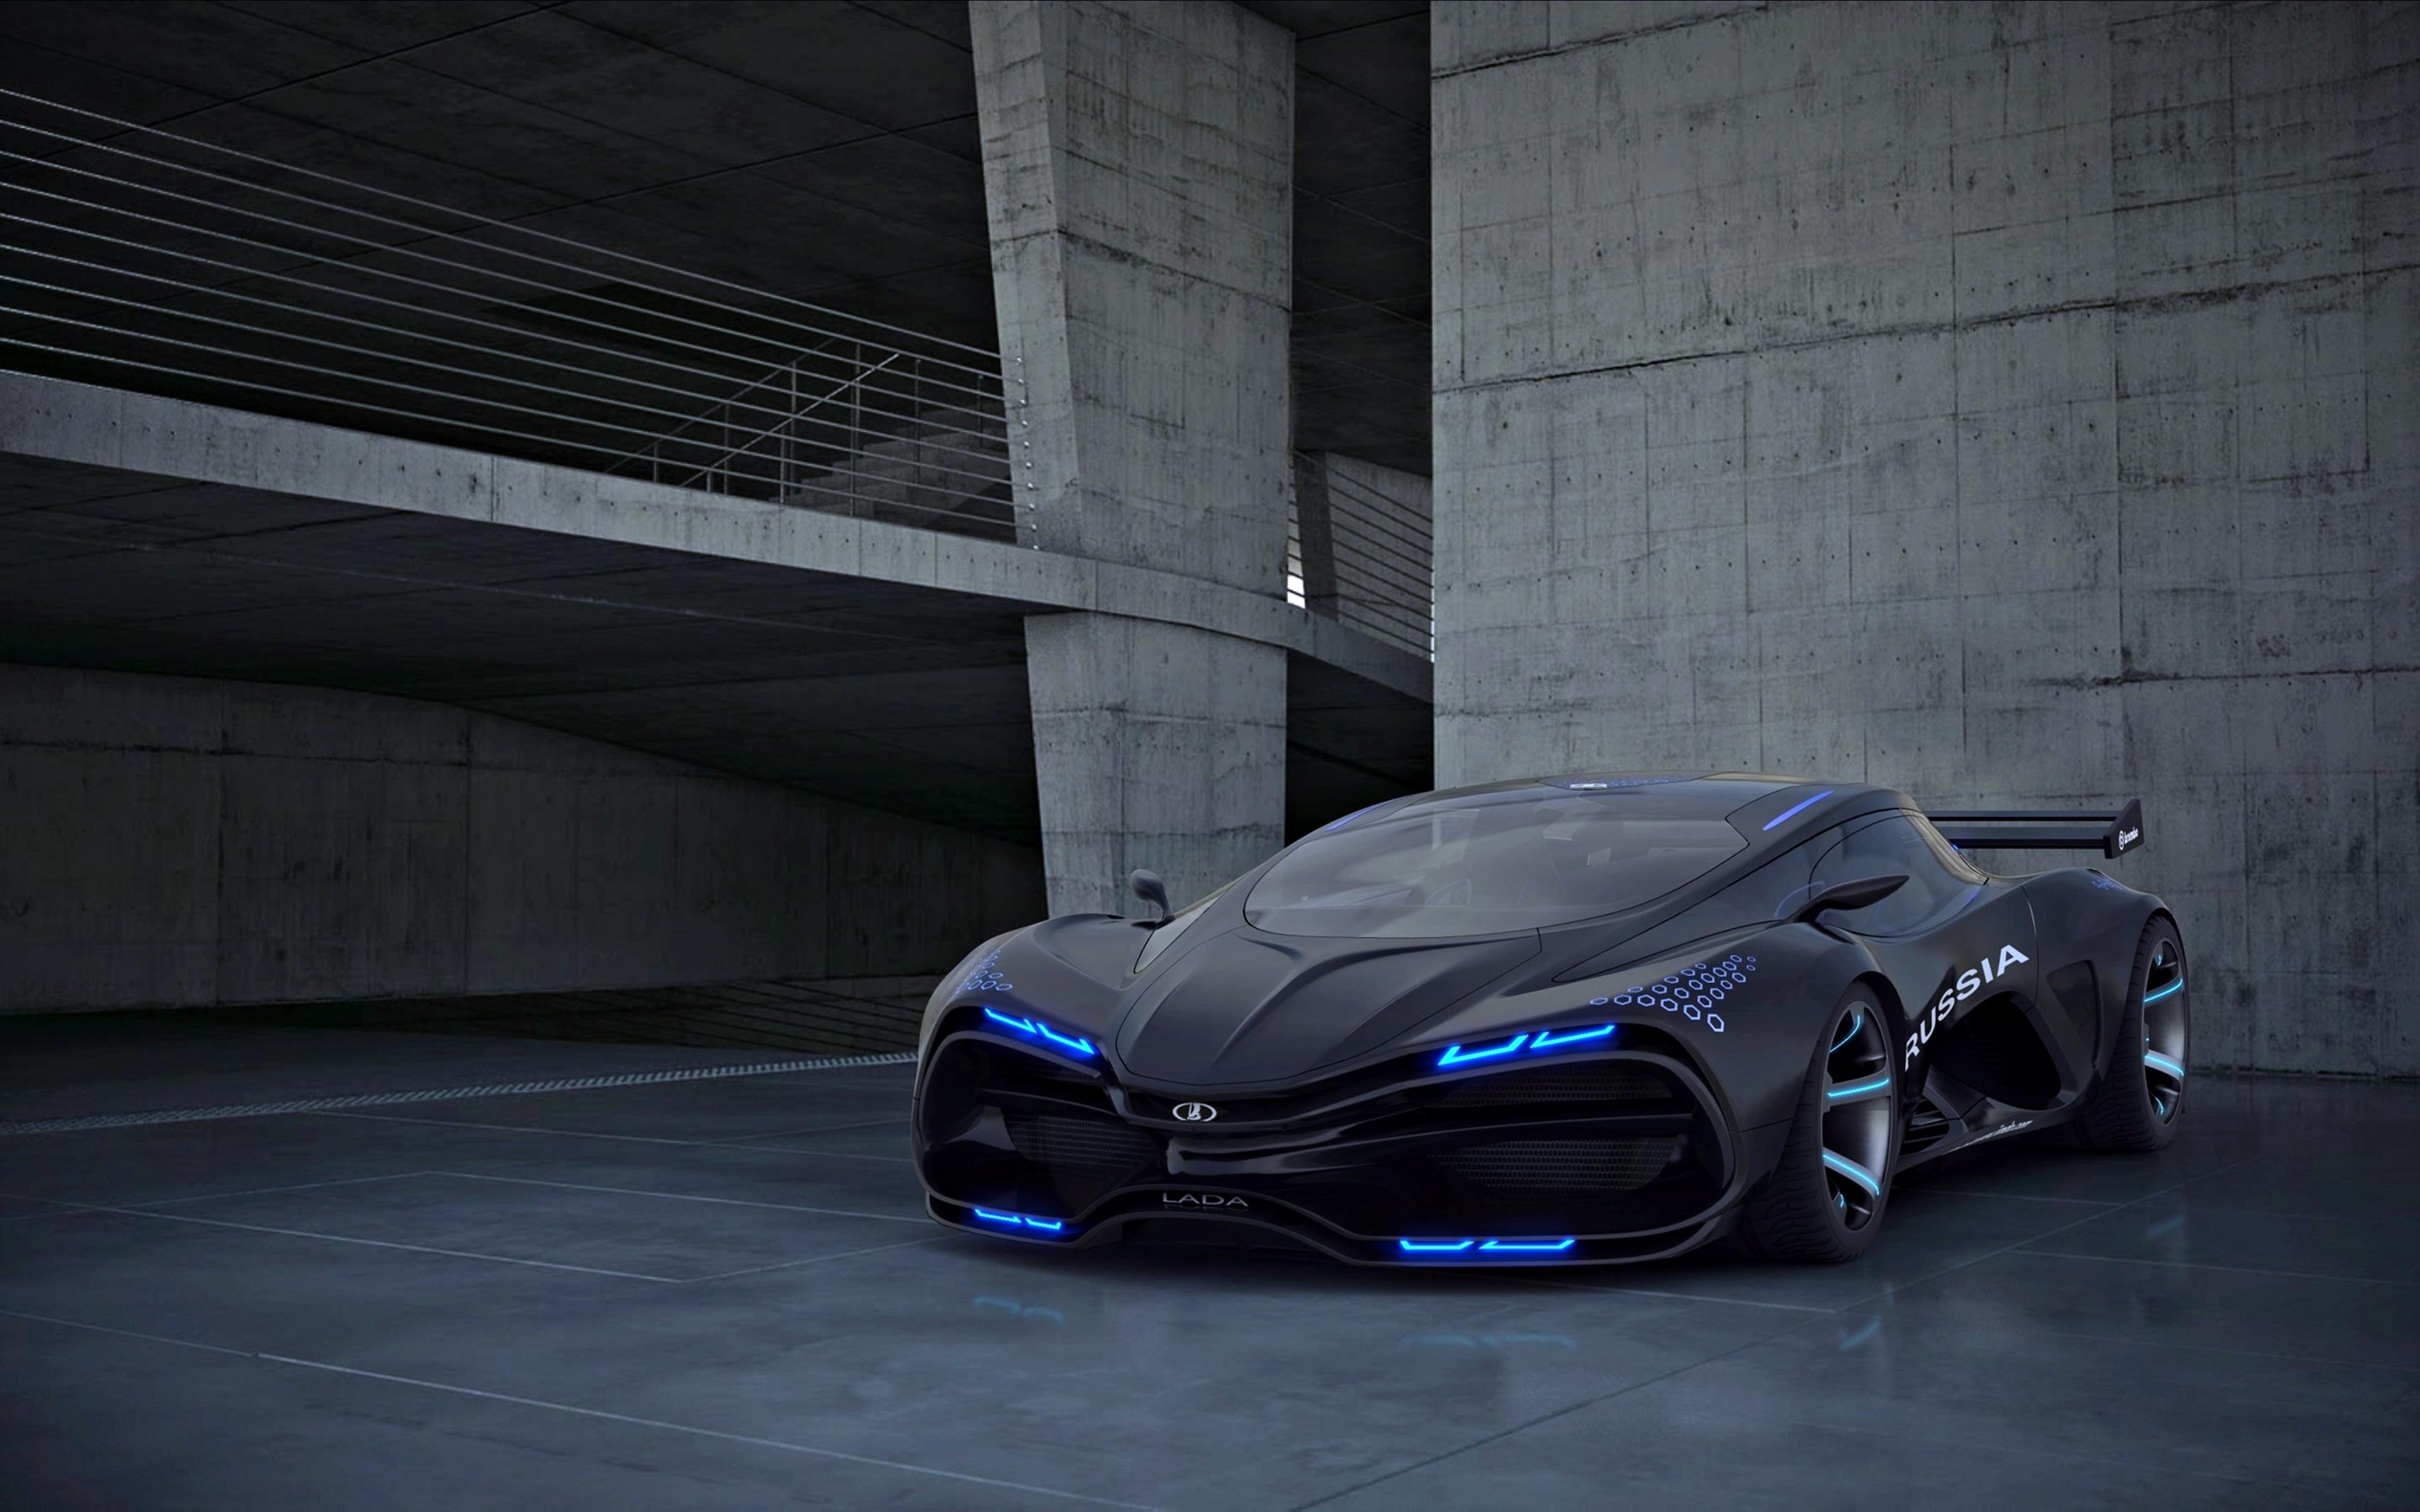 Lada Raven 4k Ultra Hd Wallpaper 4k Resolution Car 4k